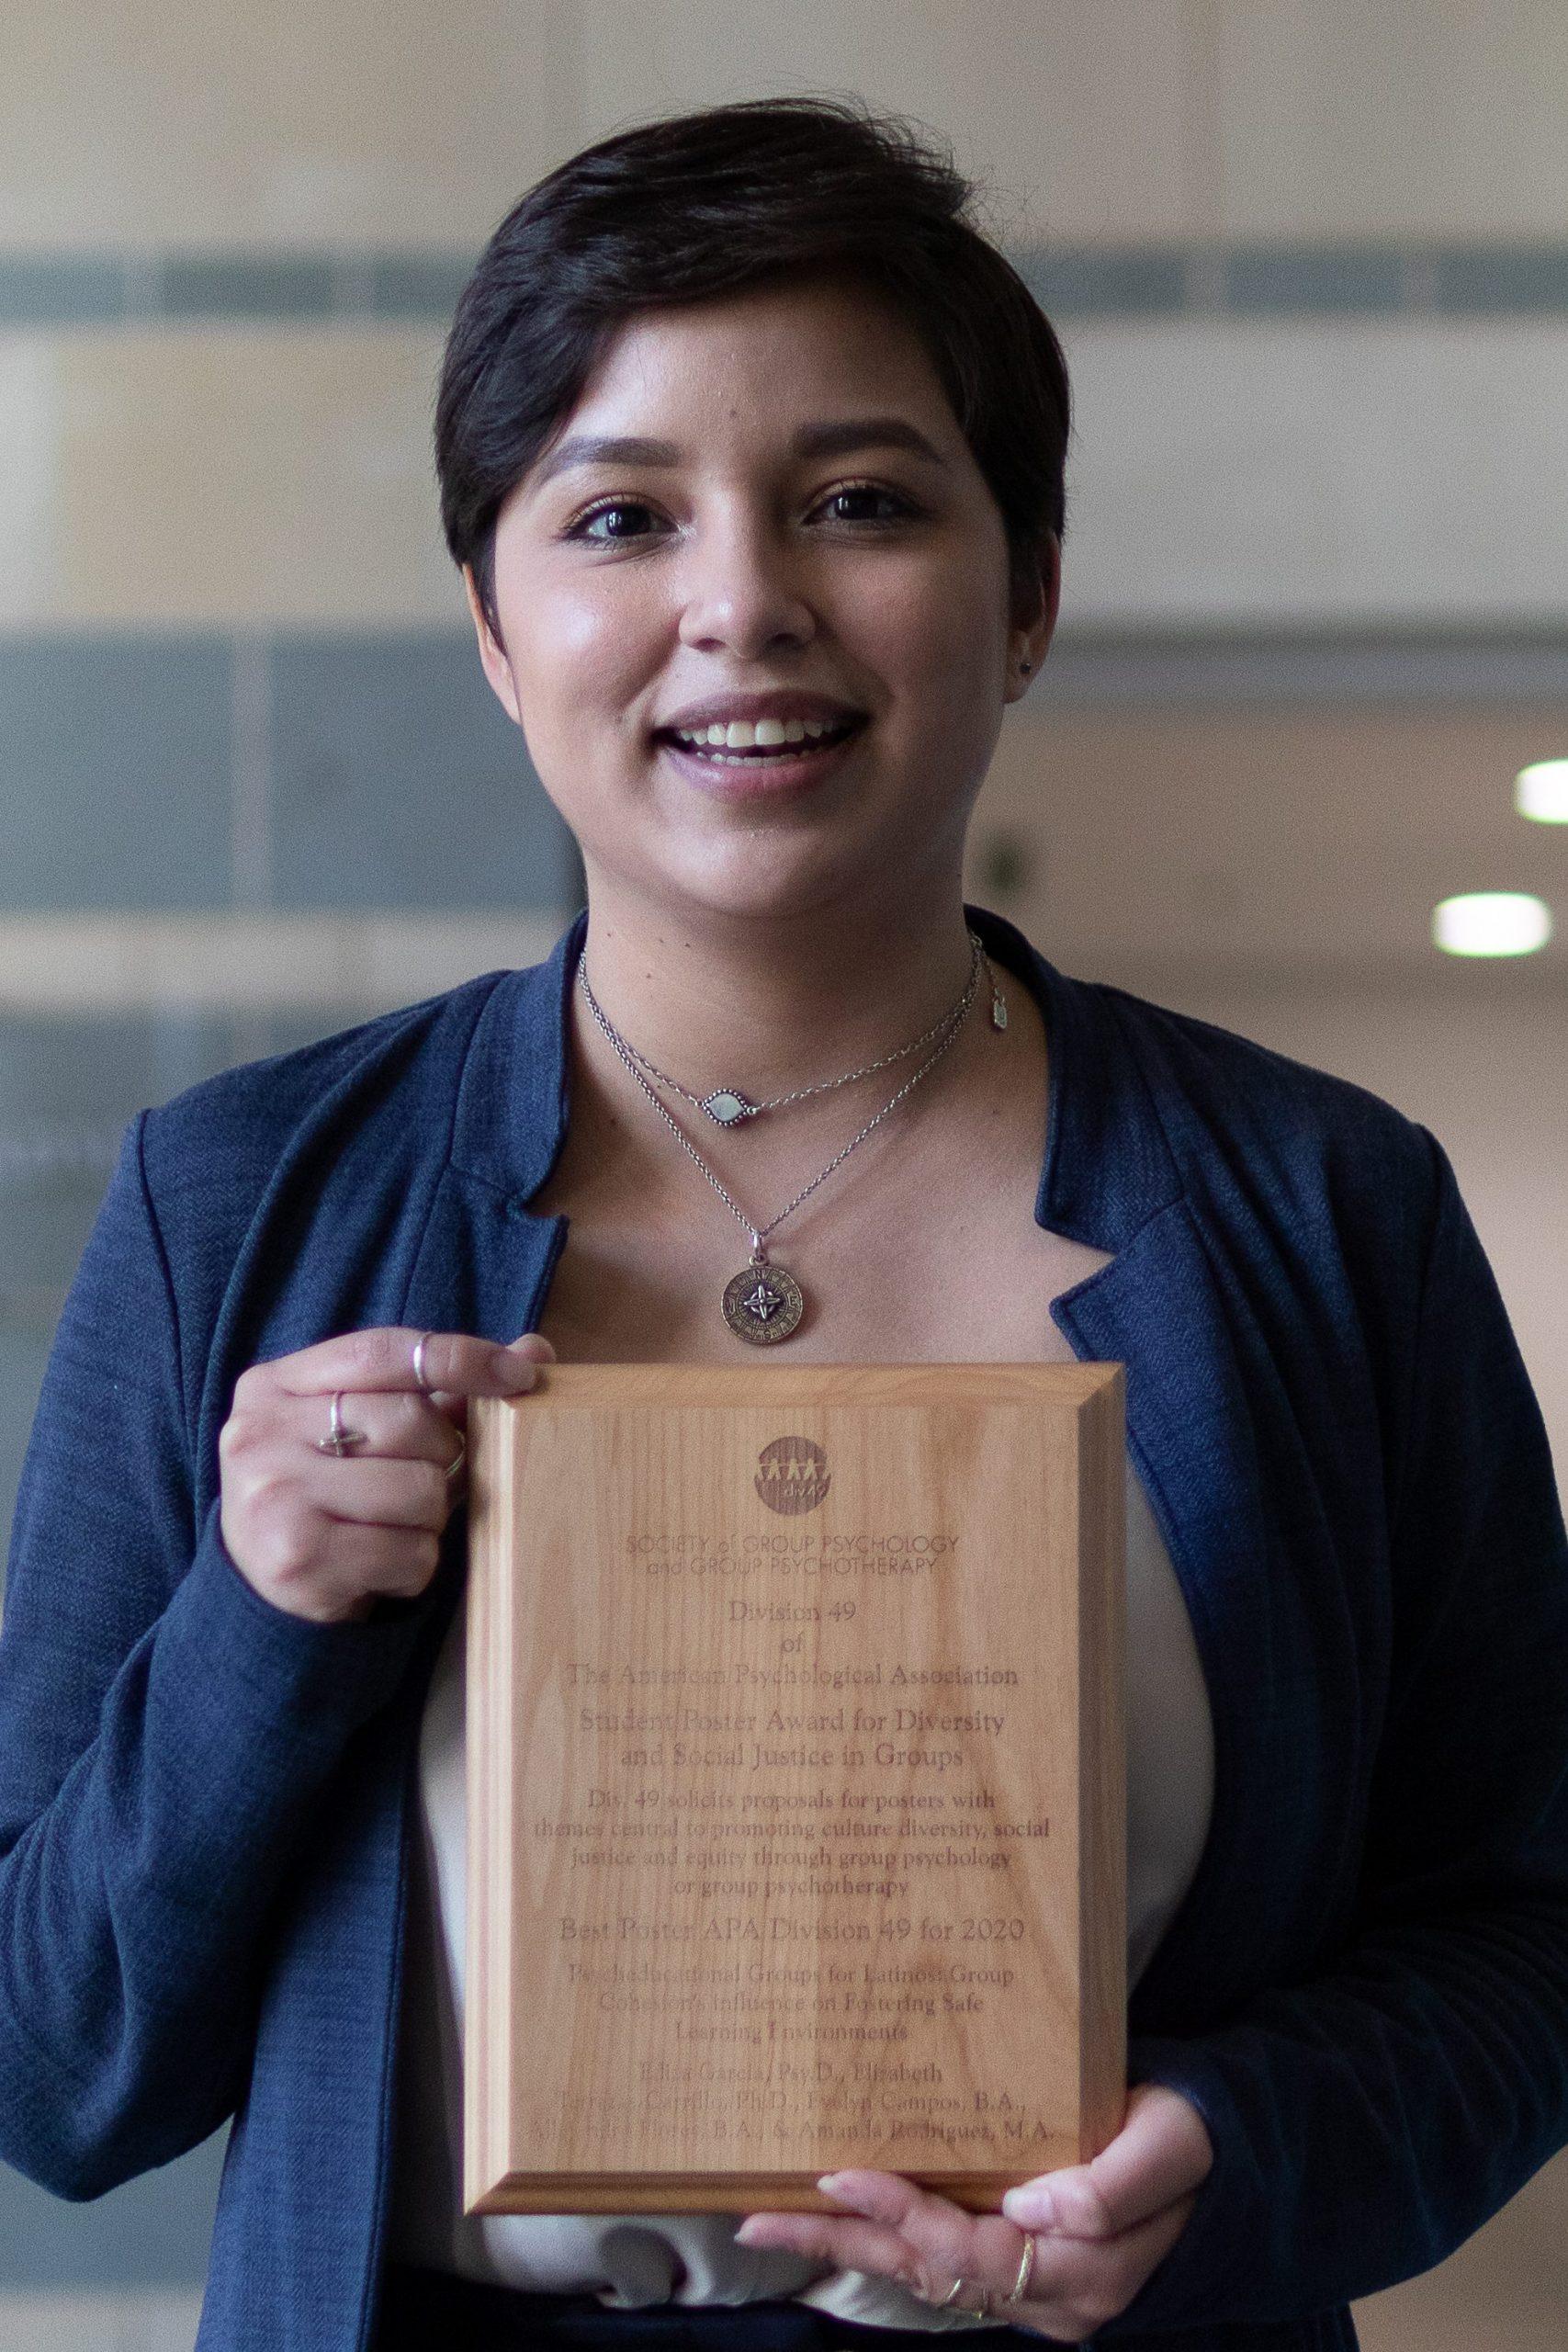 Campos with award